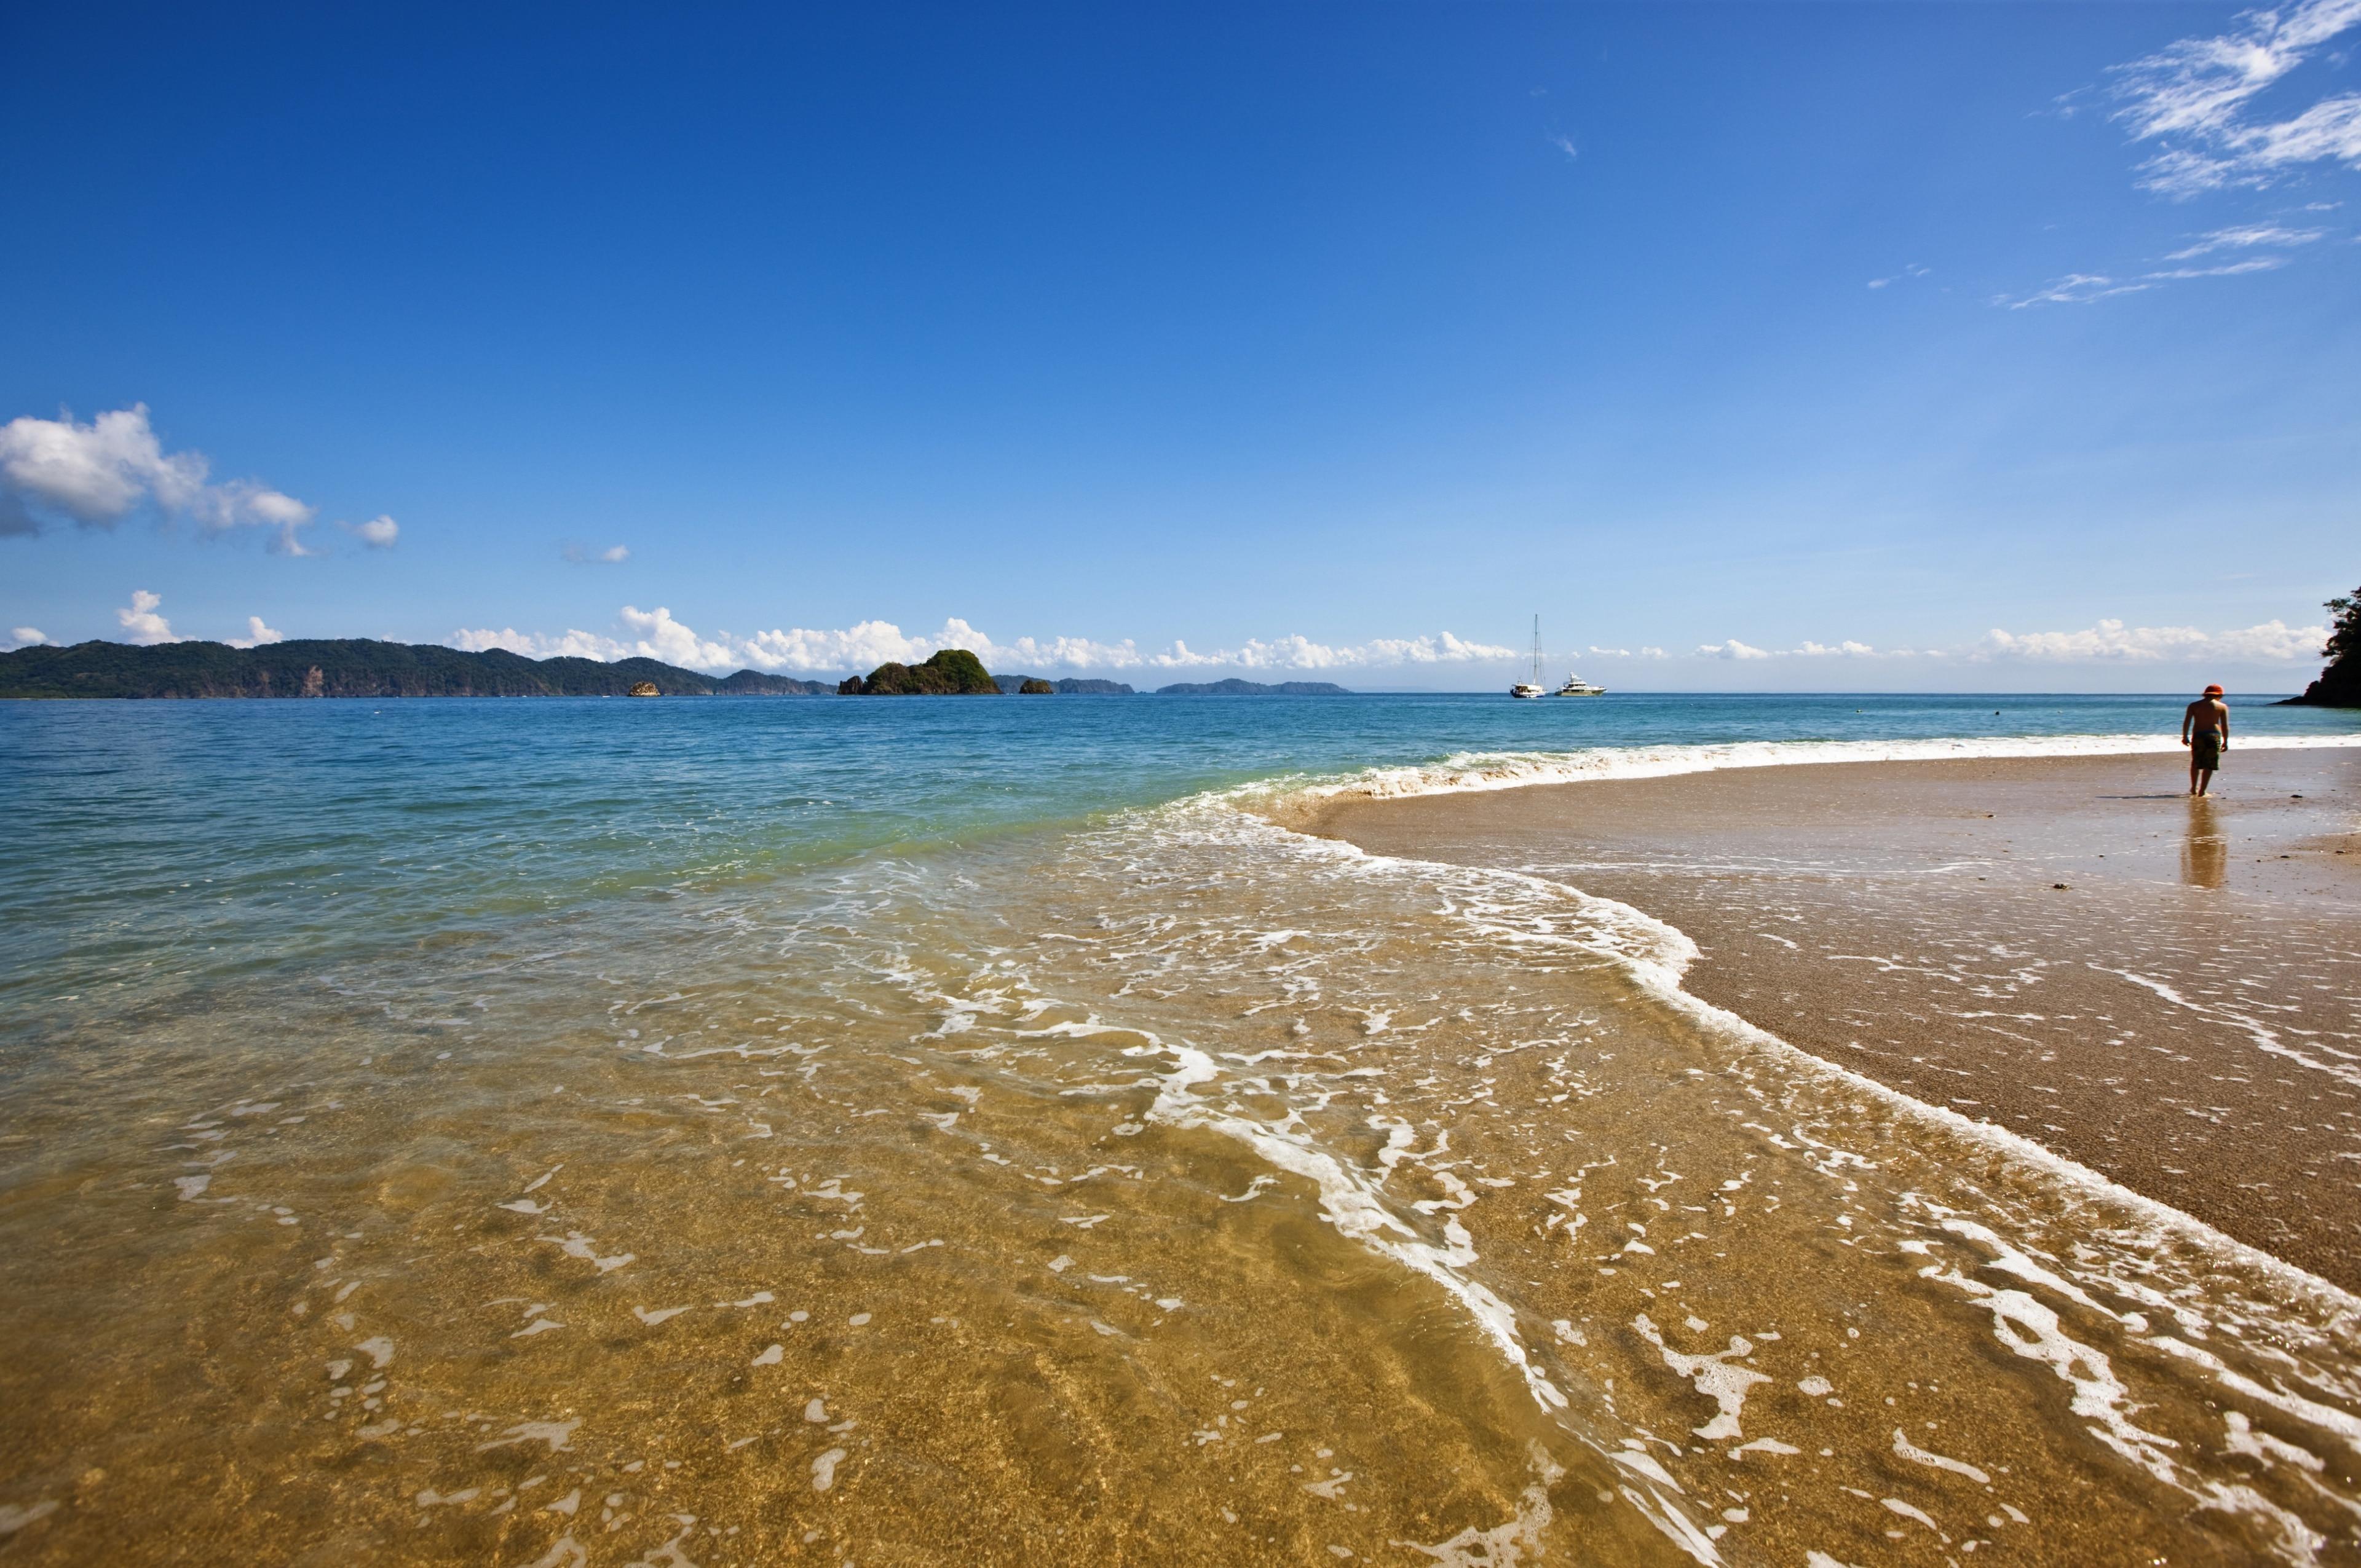 Tortuga Island, Puntarenas Province, Costa Rica